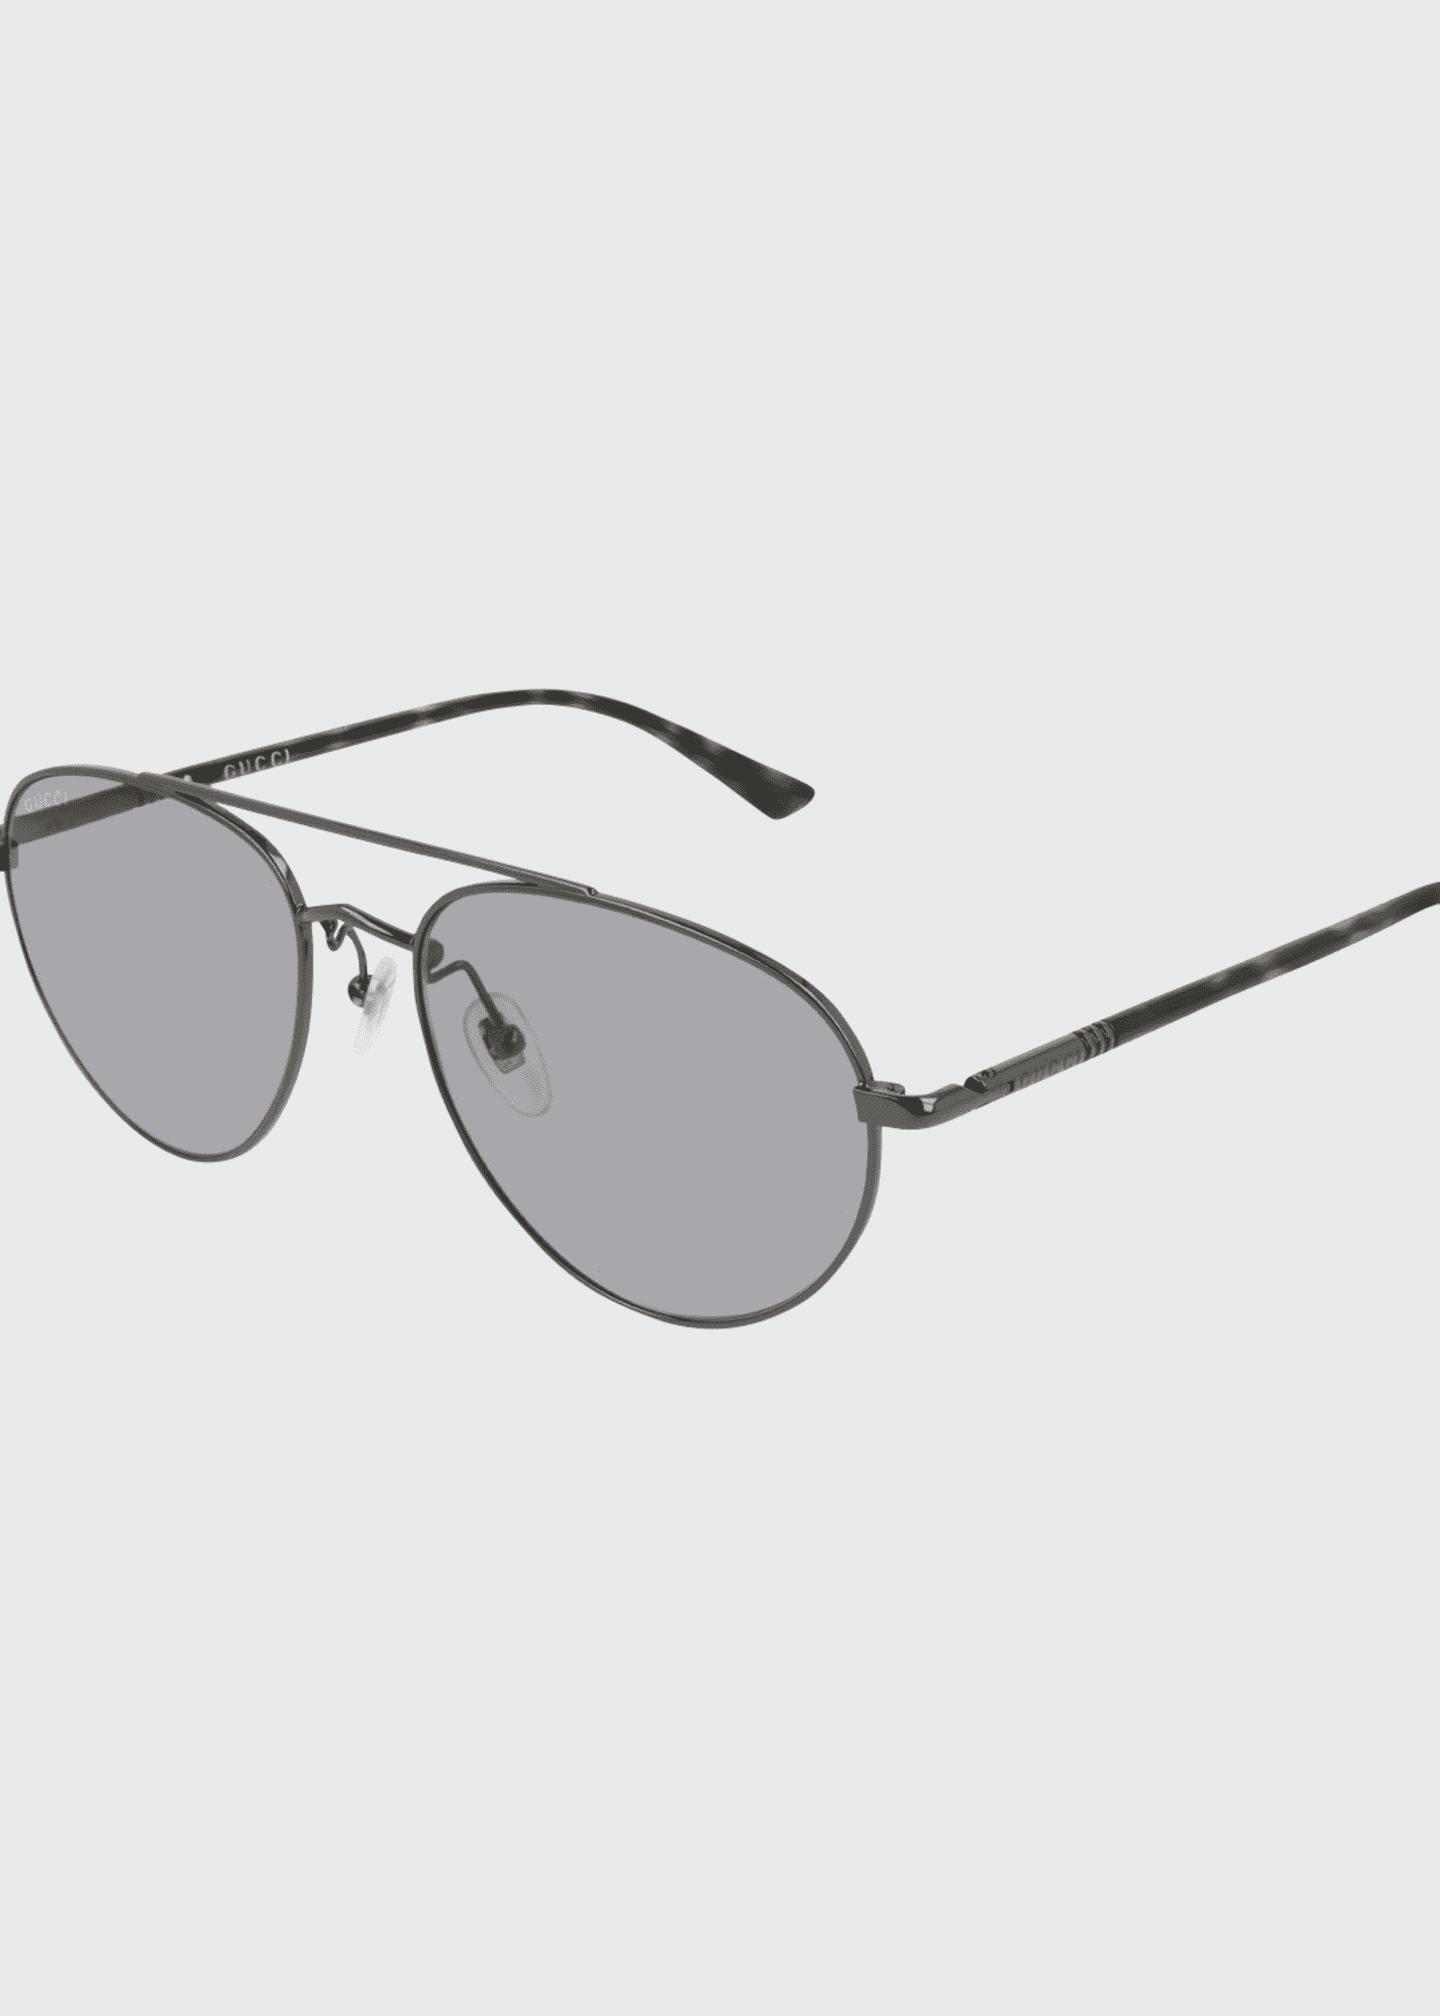 Gucci Men's GG0388S006M Metal Aviator Sunglasses